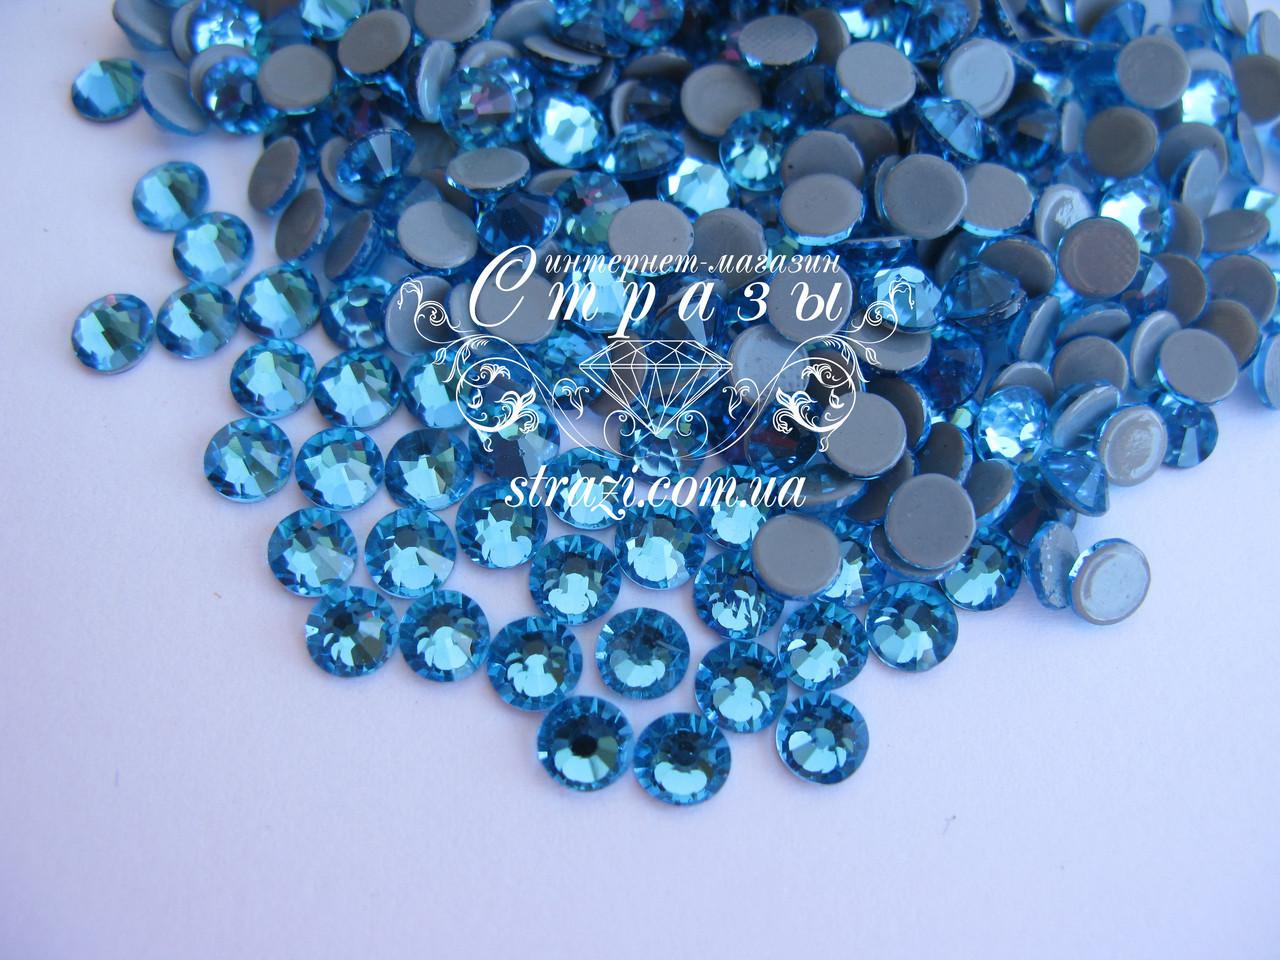 Термо стразы Lux ss16 Aquamarine (4.0mm) 100шт